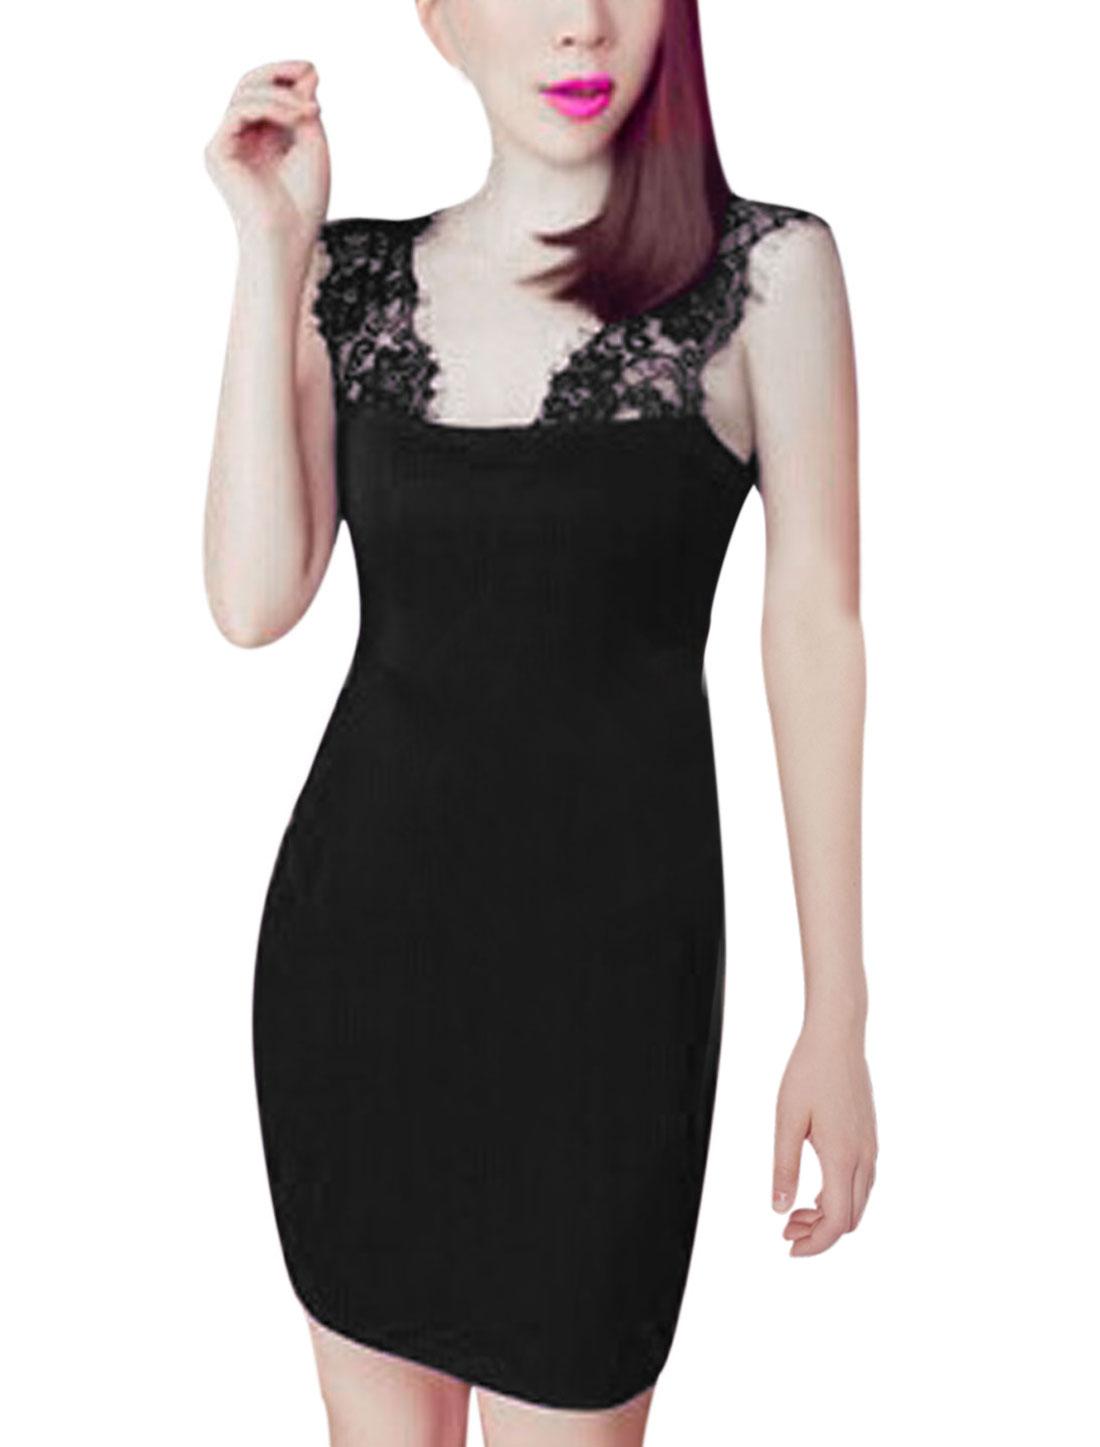 Women Lace Panel Thick Shoulder Strap Mini Stretch Dress Black S